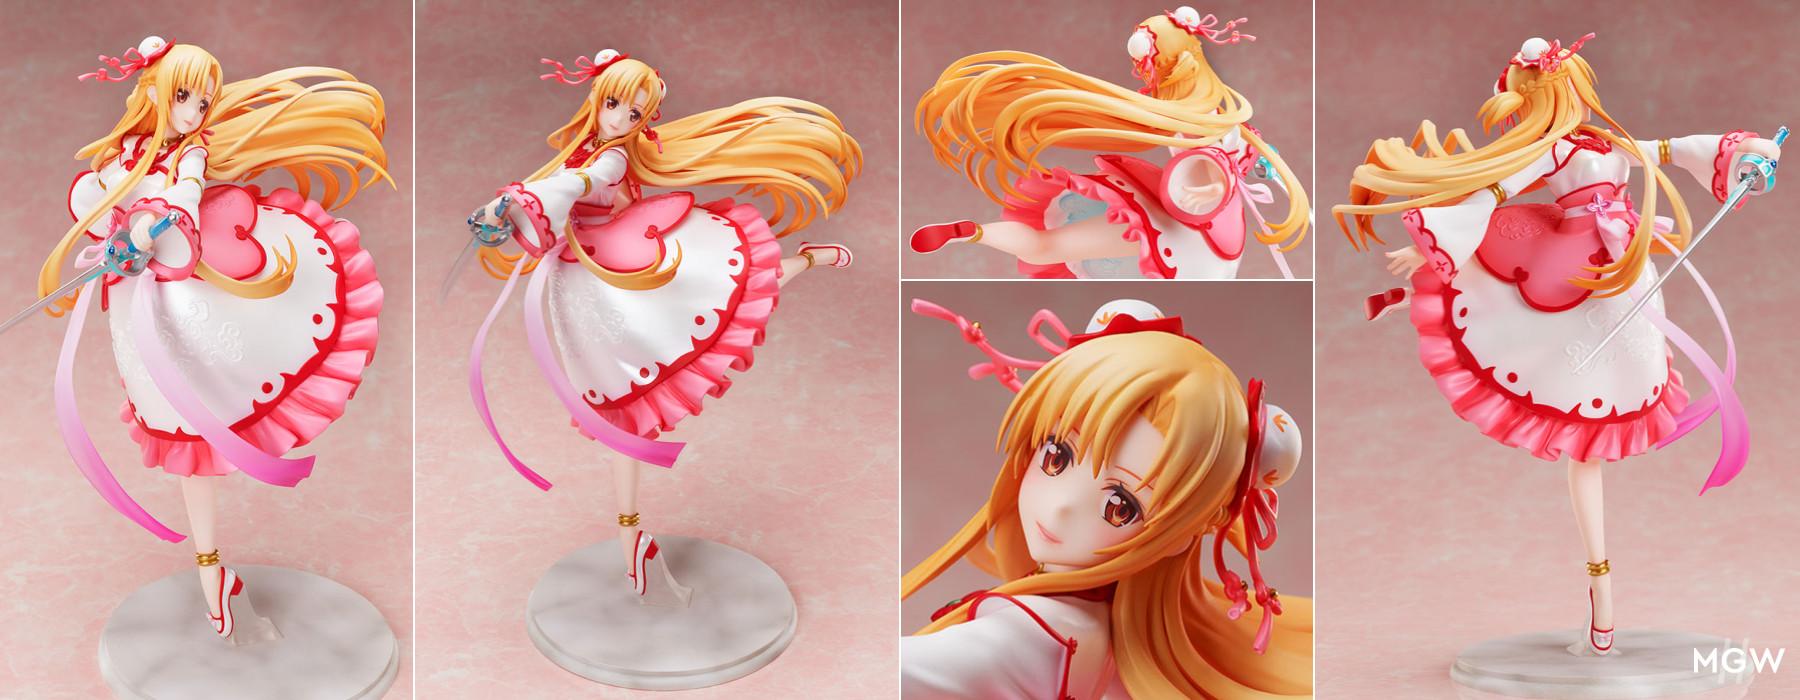 Asuna China Dress ver. by FuRyu from Sword Art Online MyGrailWatch Anime Figure Guide